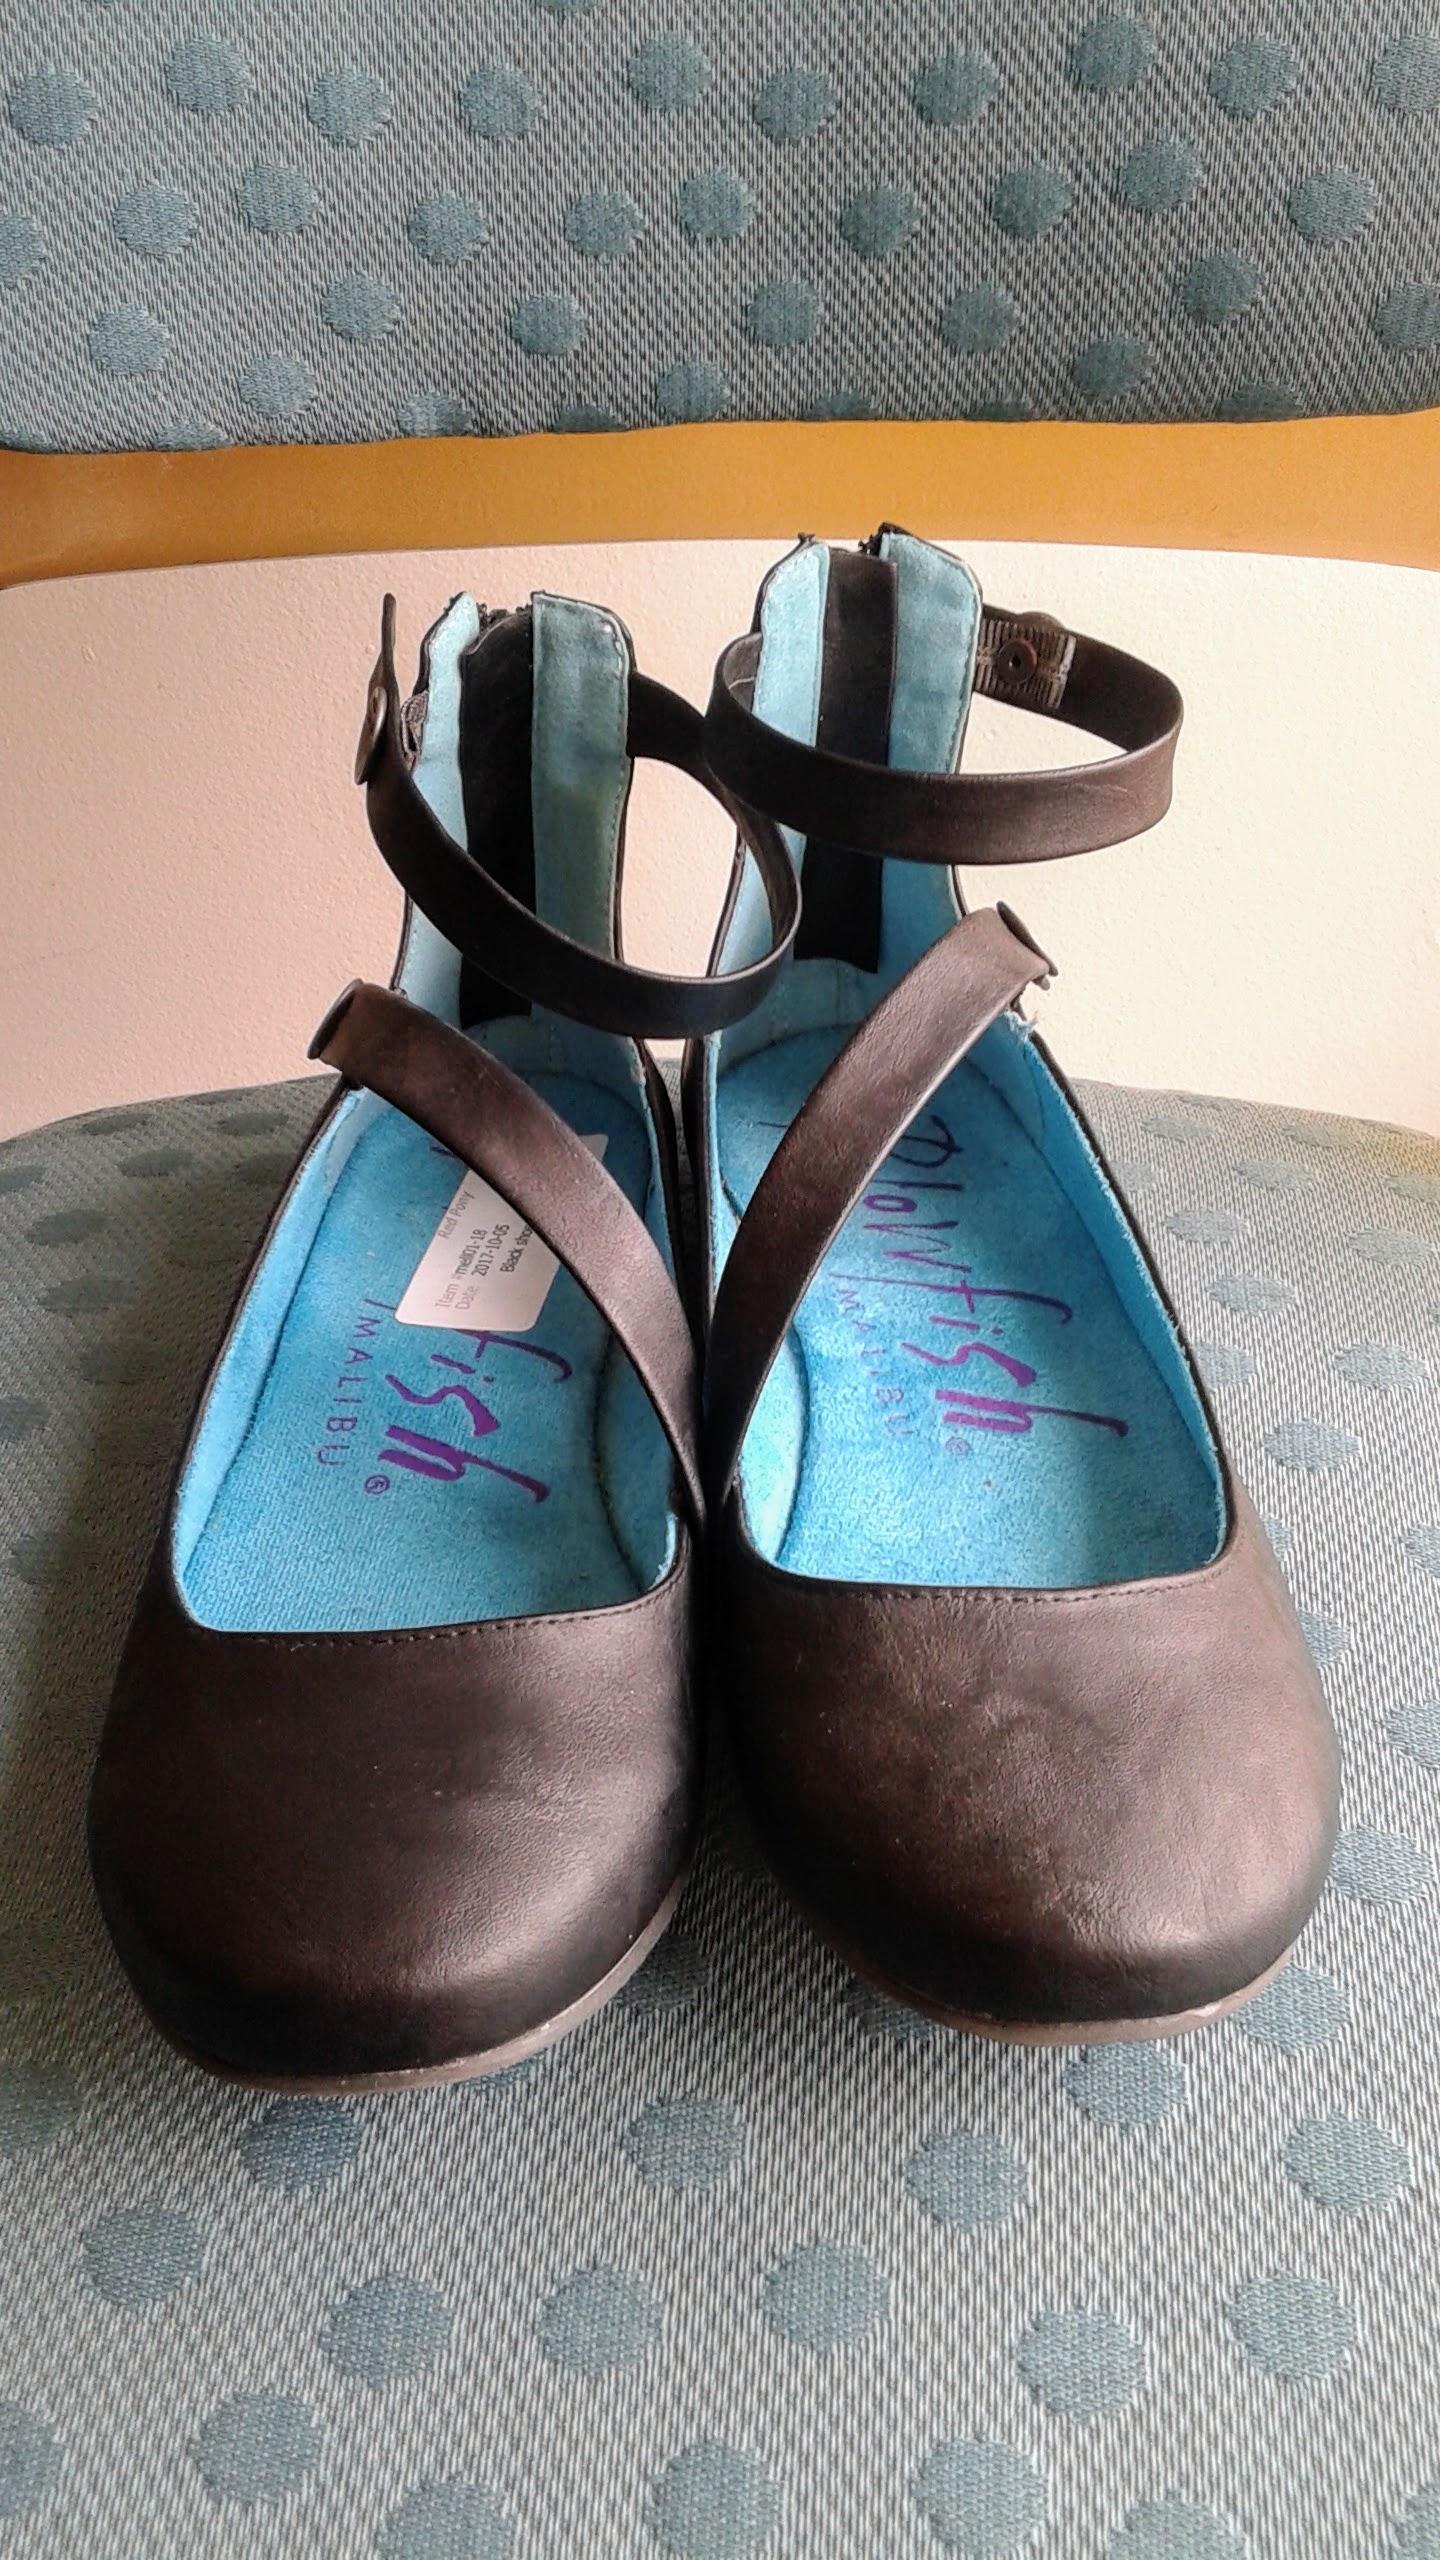 Blowfish shoes; S8, $26